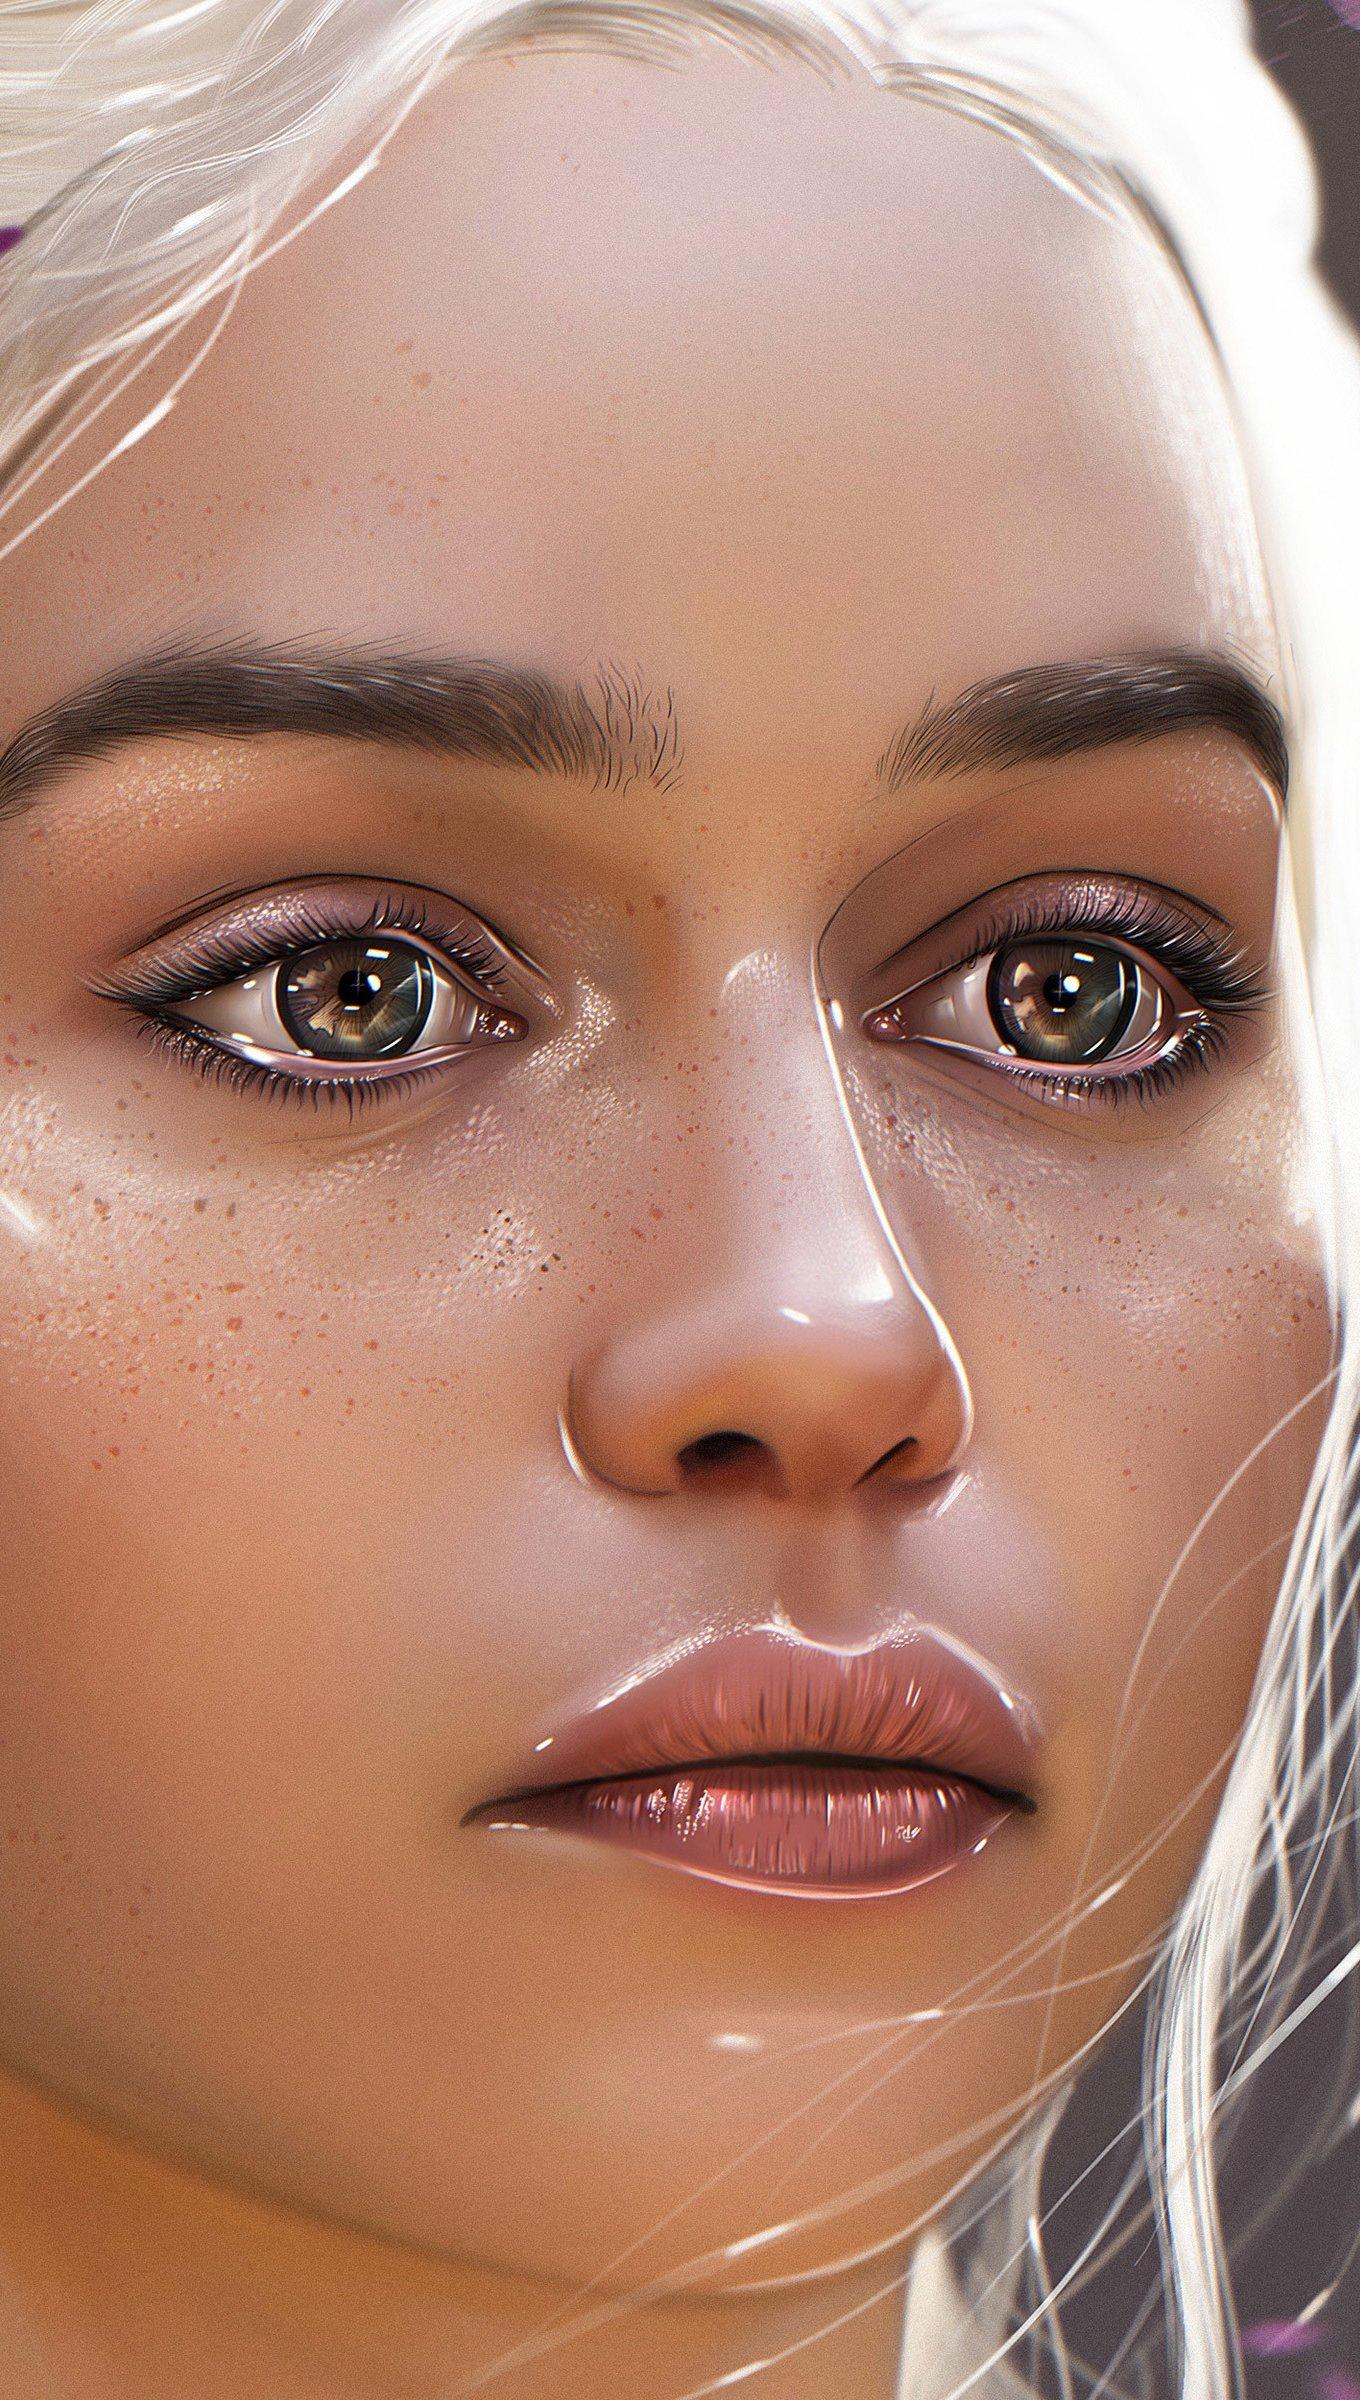 Fondos de pantalla Daenerys Targaryen Fan-art Vertical